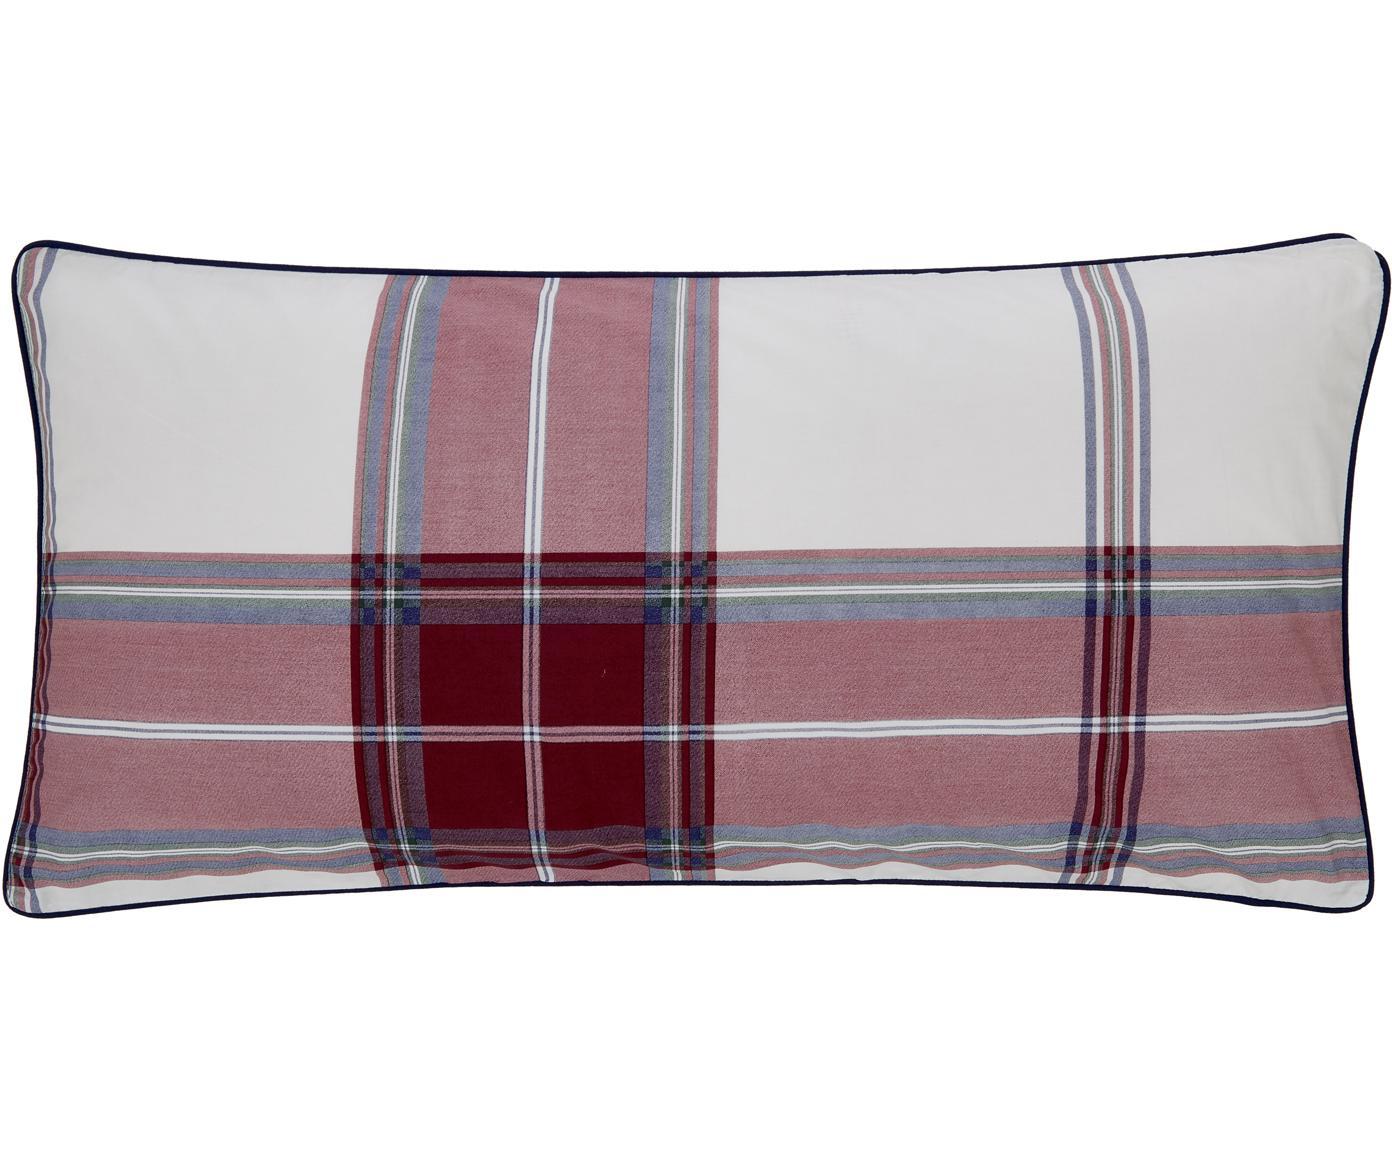 Karierte Baumwollperkal-Kissenbezüge Scarlet mit Keder, 2 Stück, Webart: Perkal Fadendichte 180 TC, Cremeweiß, Rot, Blau, 40 x 80 cm